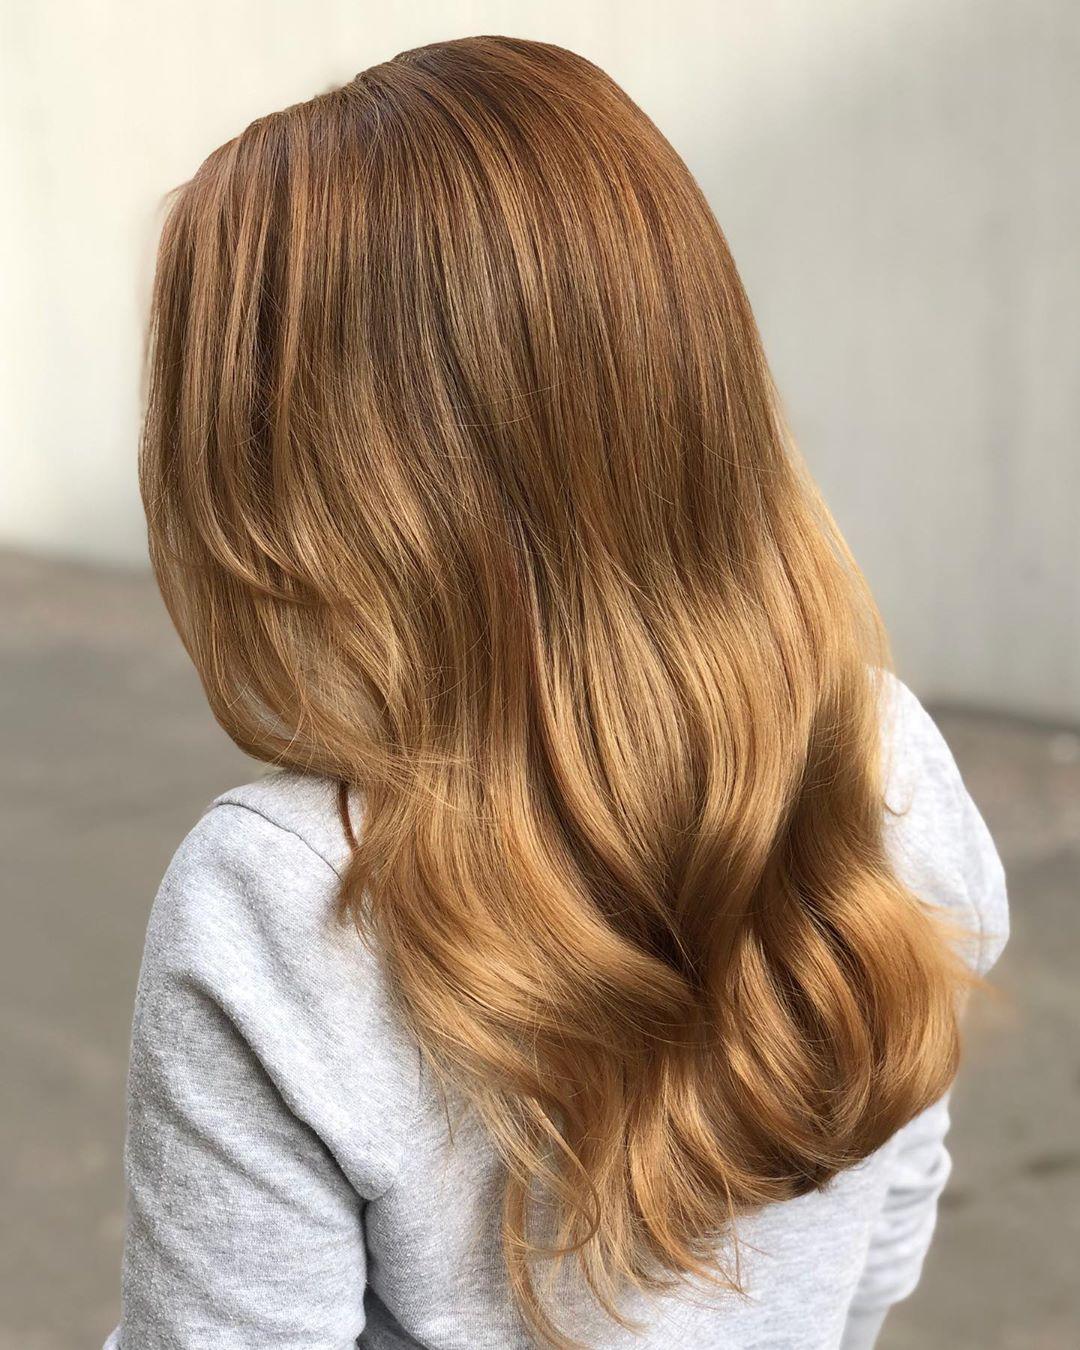 Light Golden Brown on Natural Hair